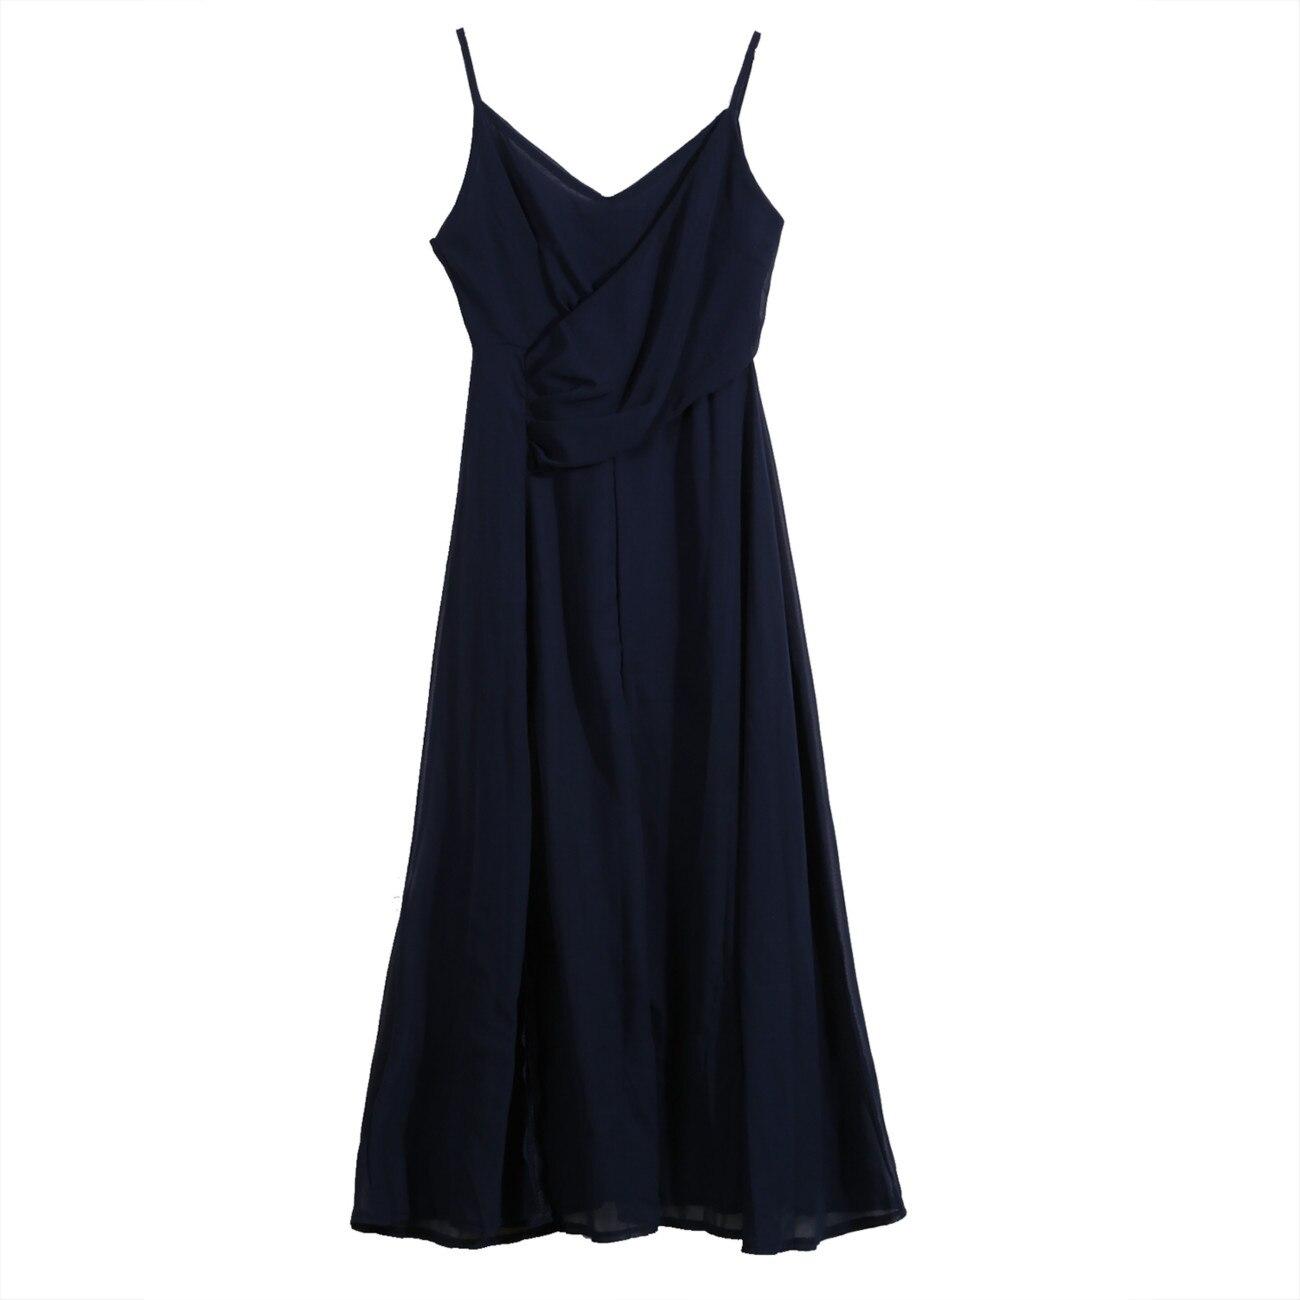 Fashion Women Maxi Boho Solid Summer Beach Long Dress Party V-Neck High Split Dresses